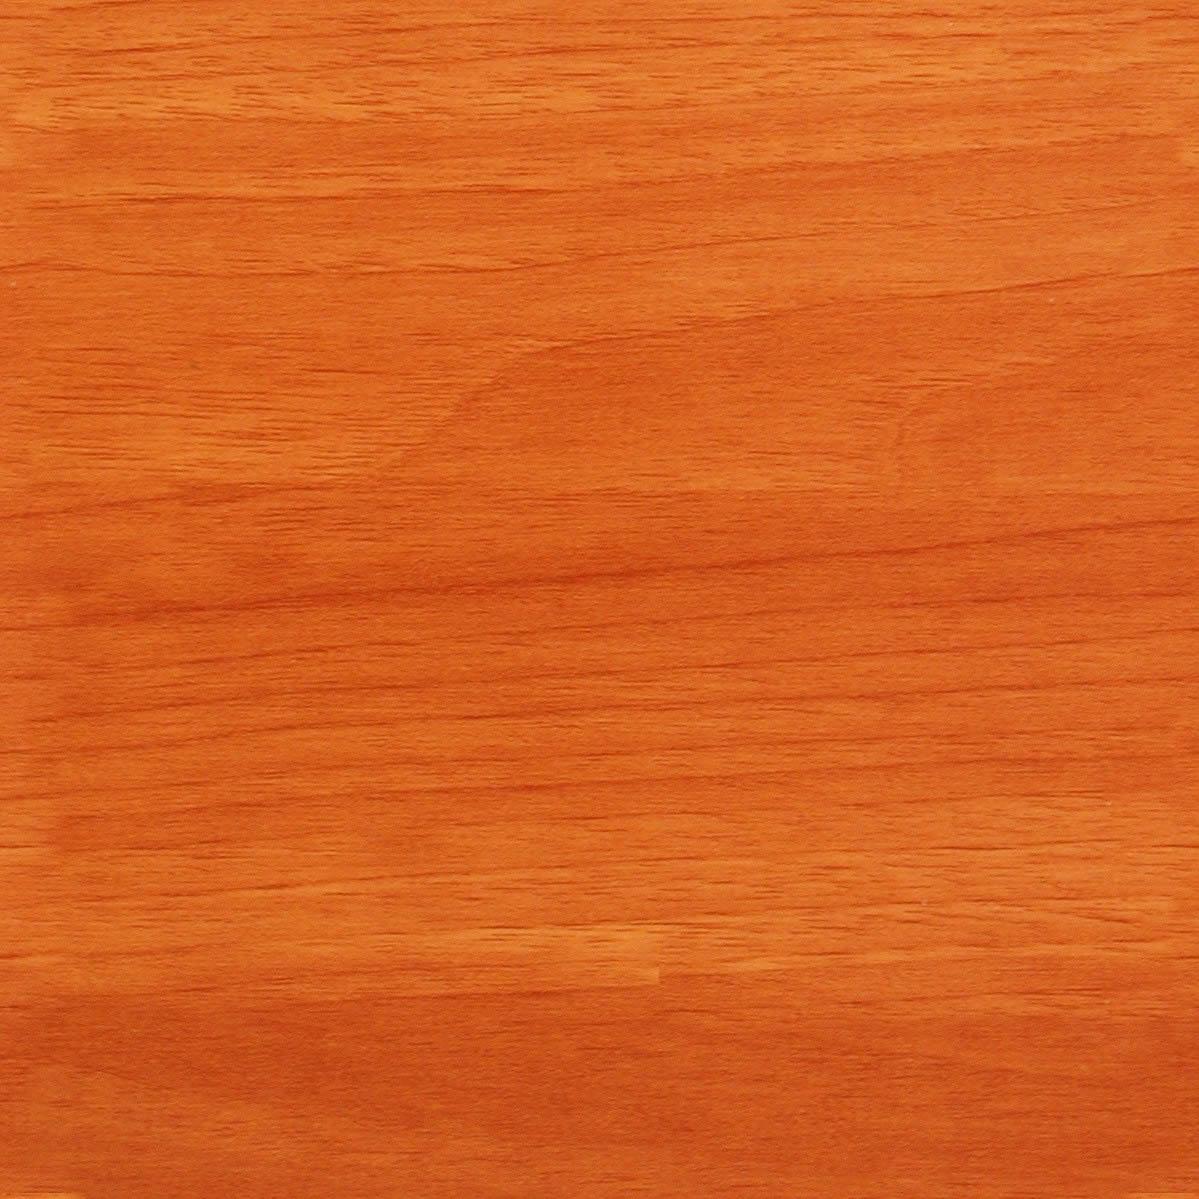 imagen Madera para puertas, en Hatch madera - Texturas